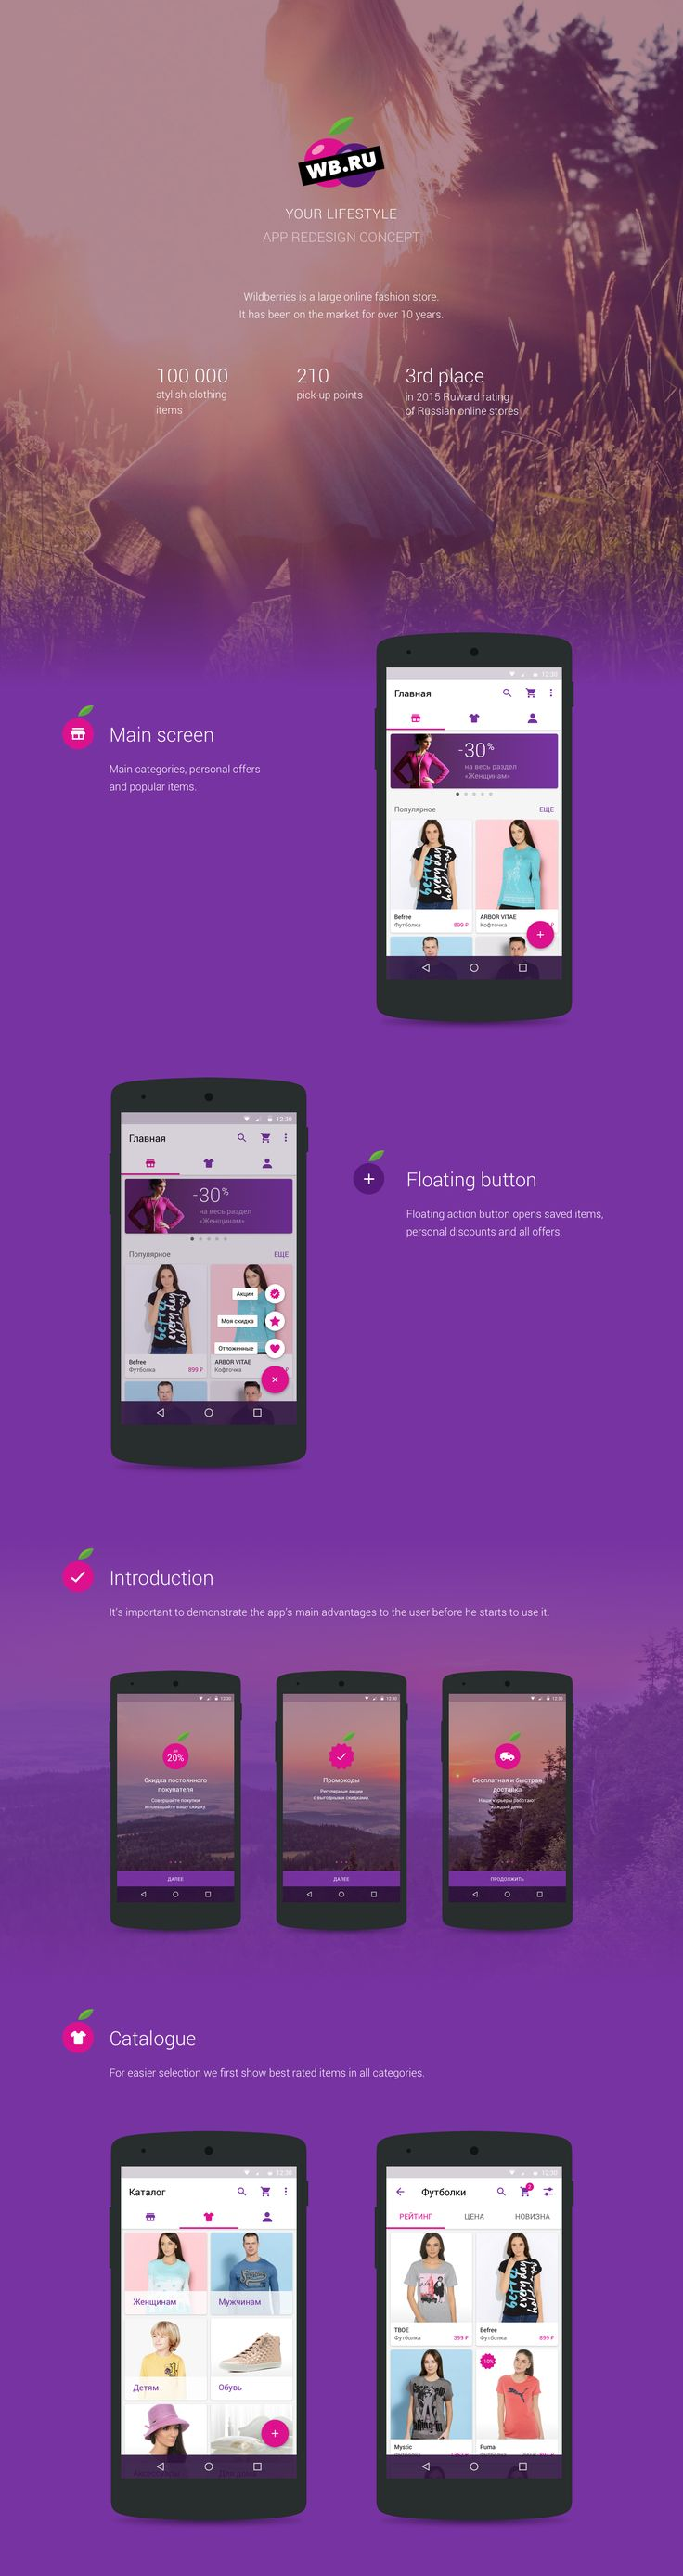 Wildberries App Redesign Concept on Behance